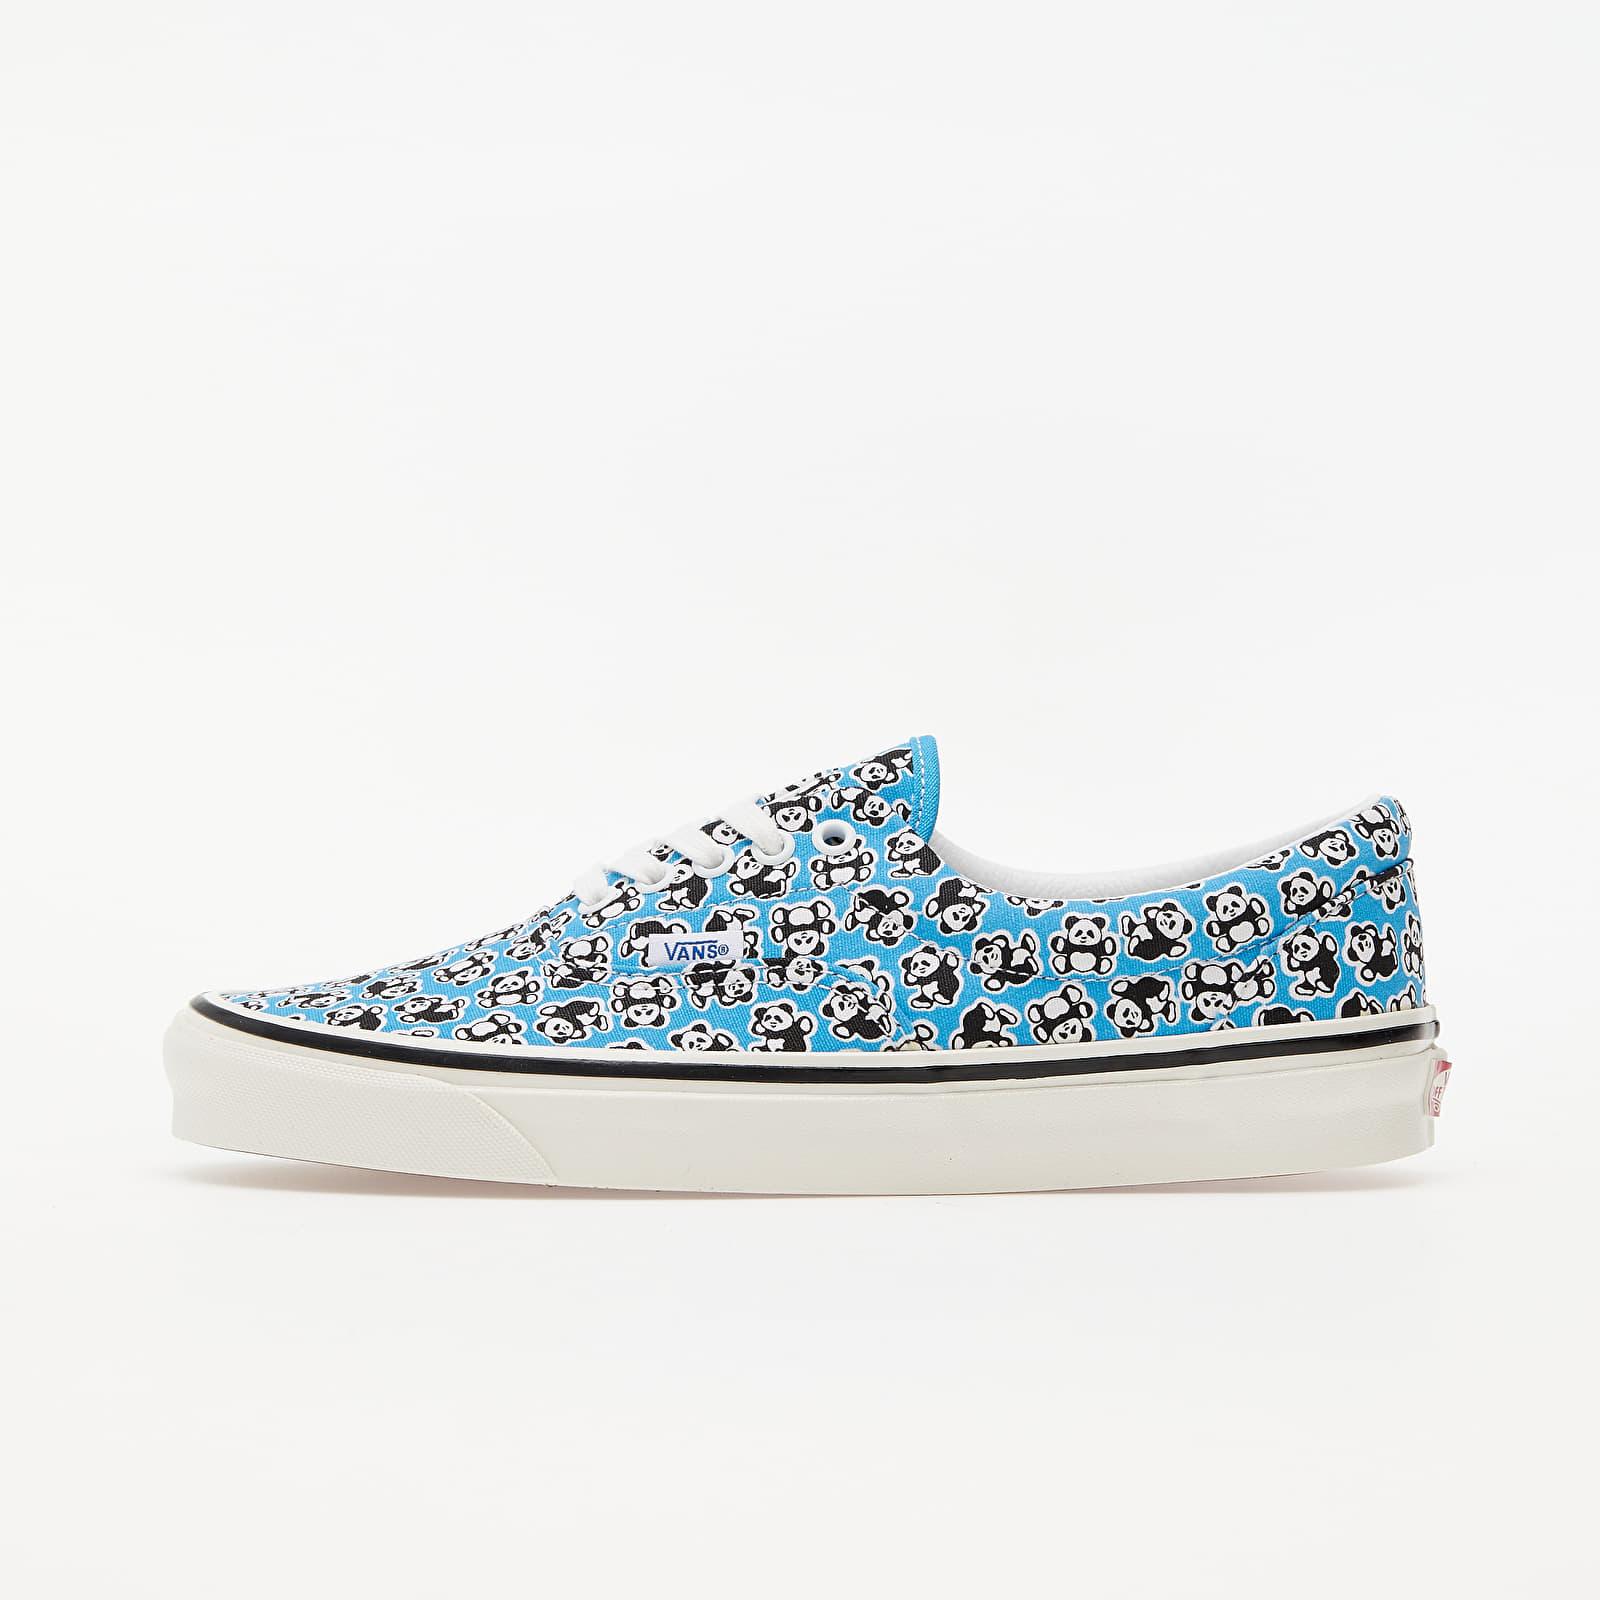 Men's shoes Vans Era 95 DX (Anaheim Factory) Og Pandas/ Og Blue